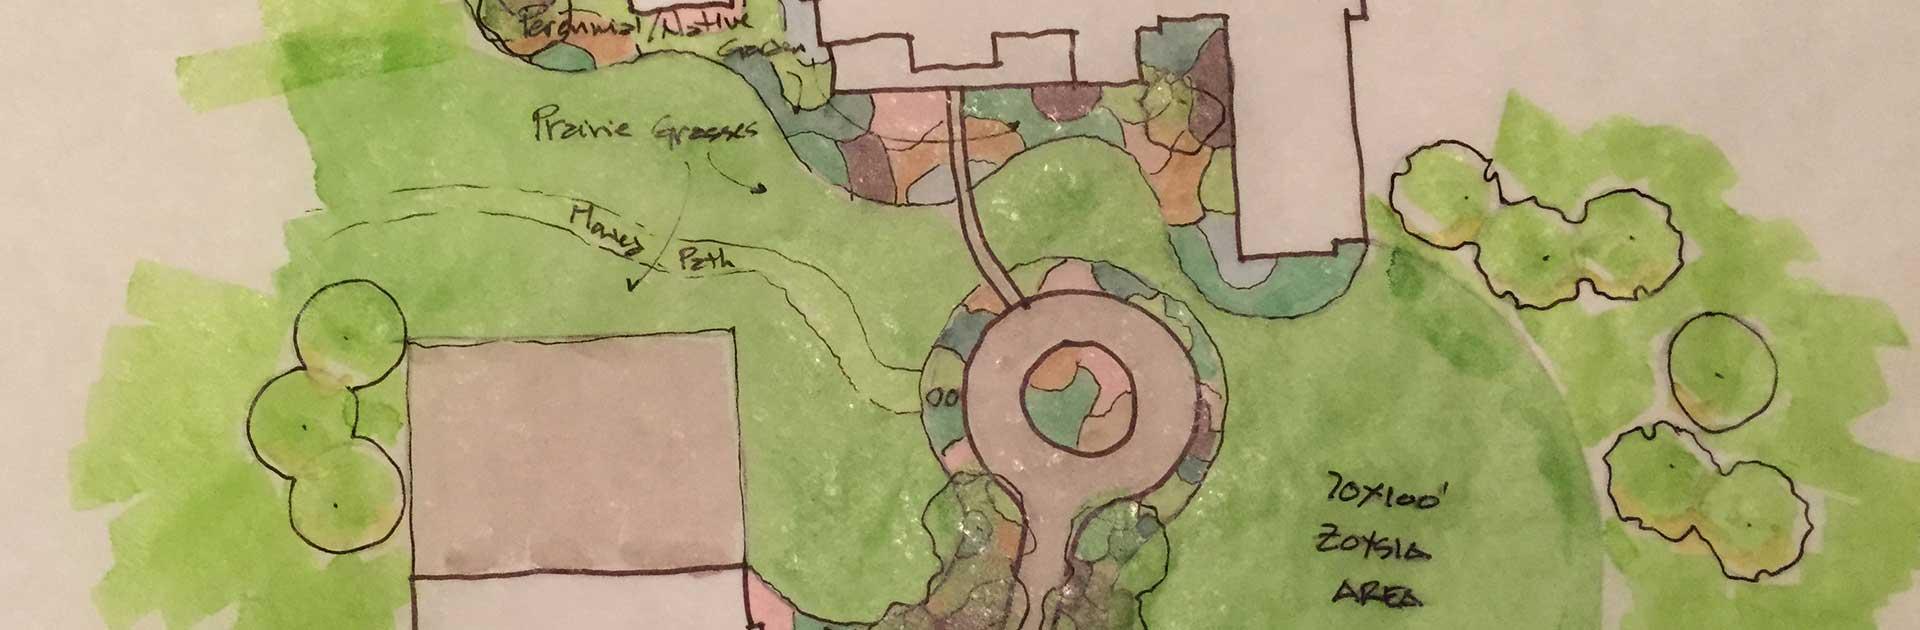 Outdoor Design Plans